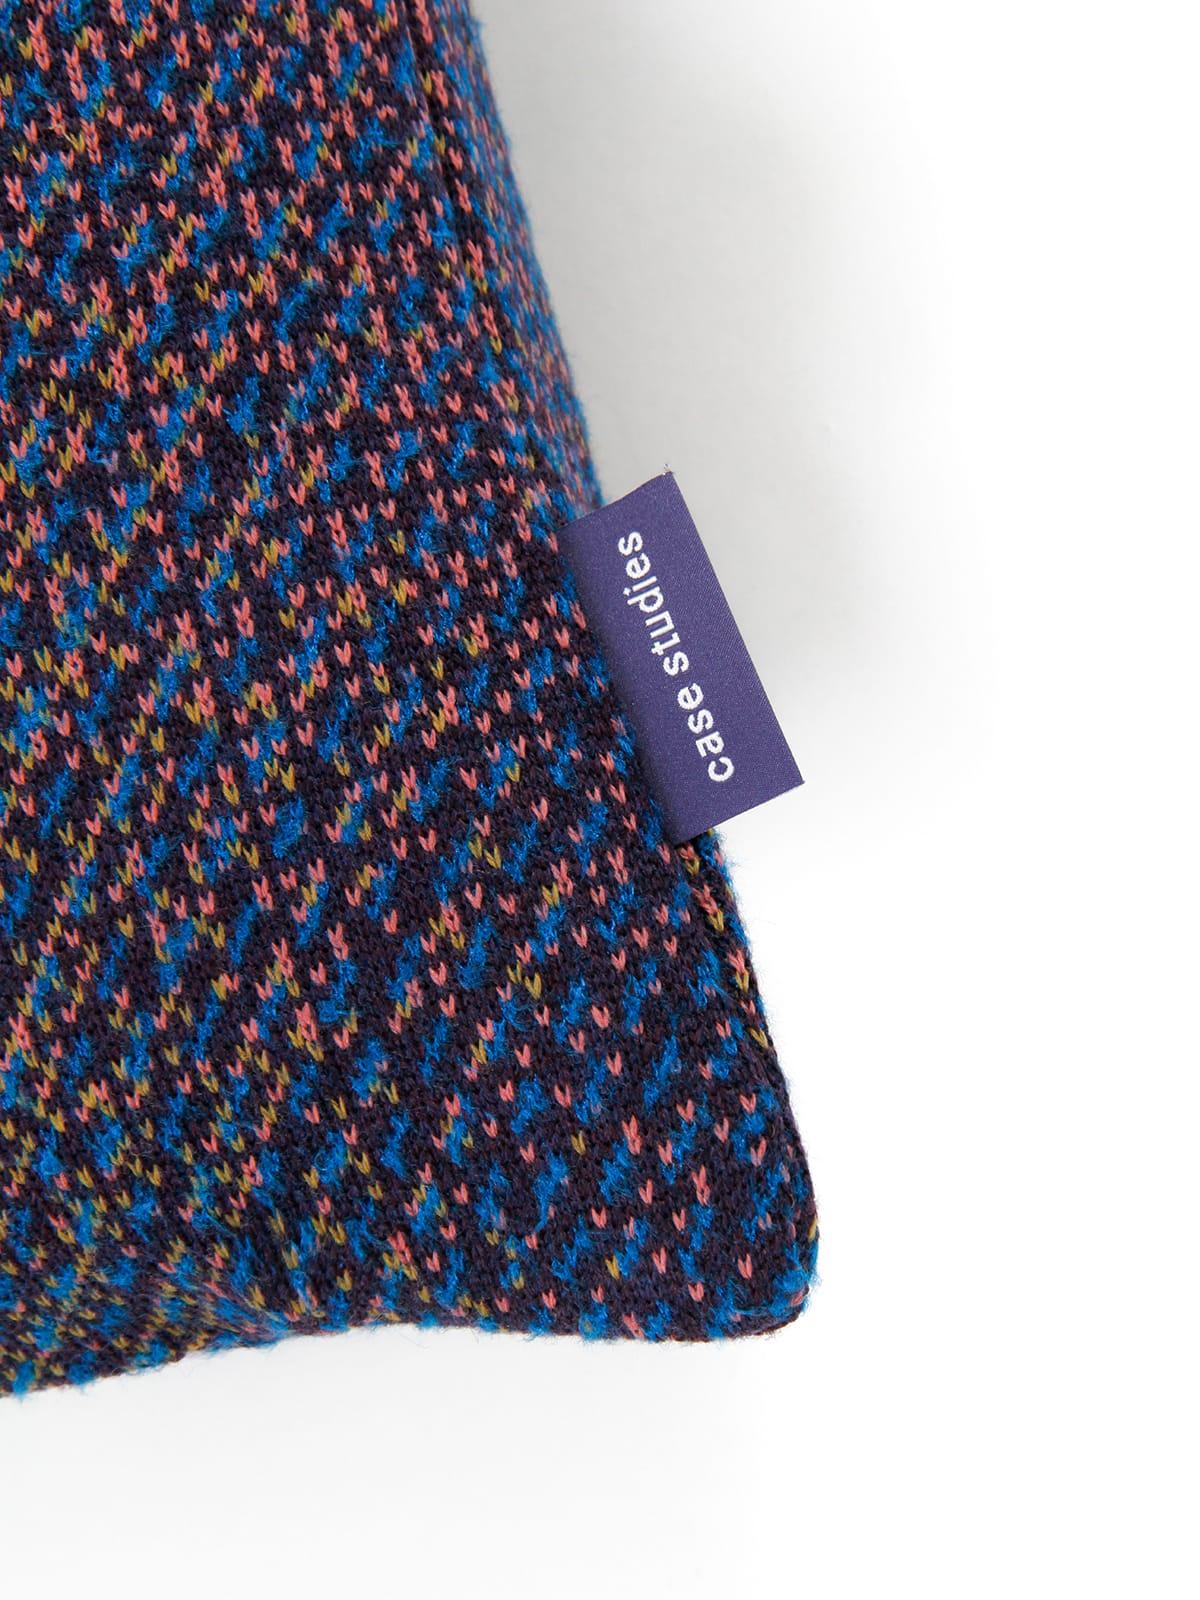 Knitted Cushion 50x50 Paris - Merino Wool detail